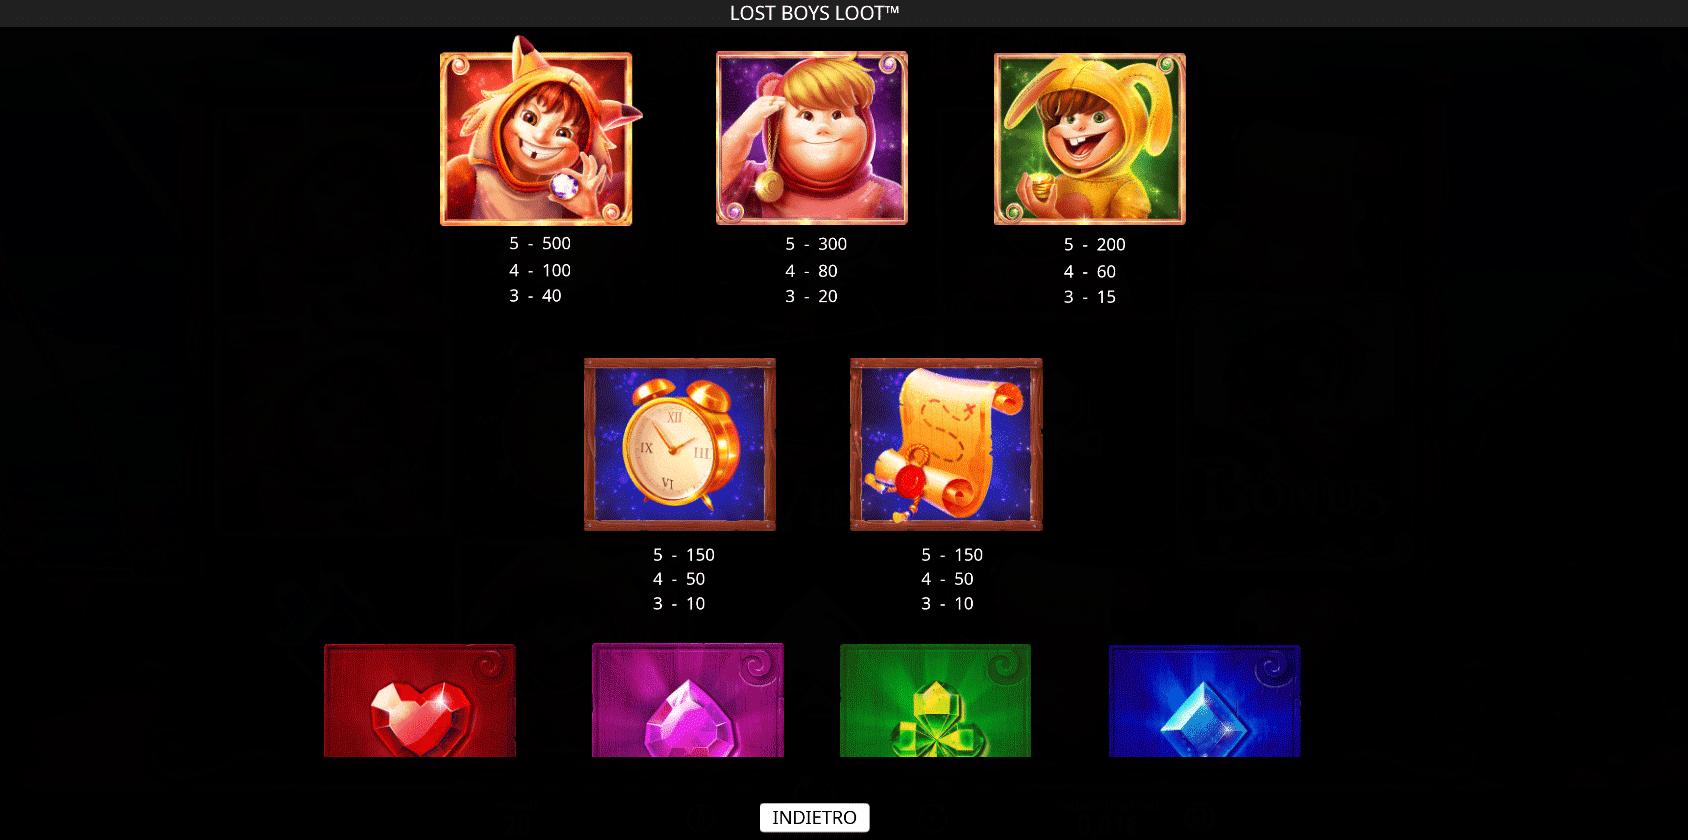 paytable della slot machine online lost boys loot